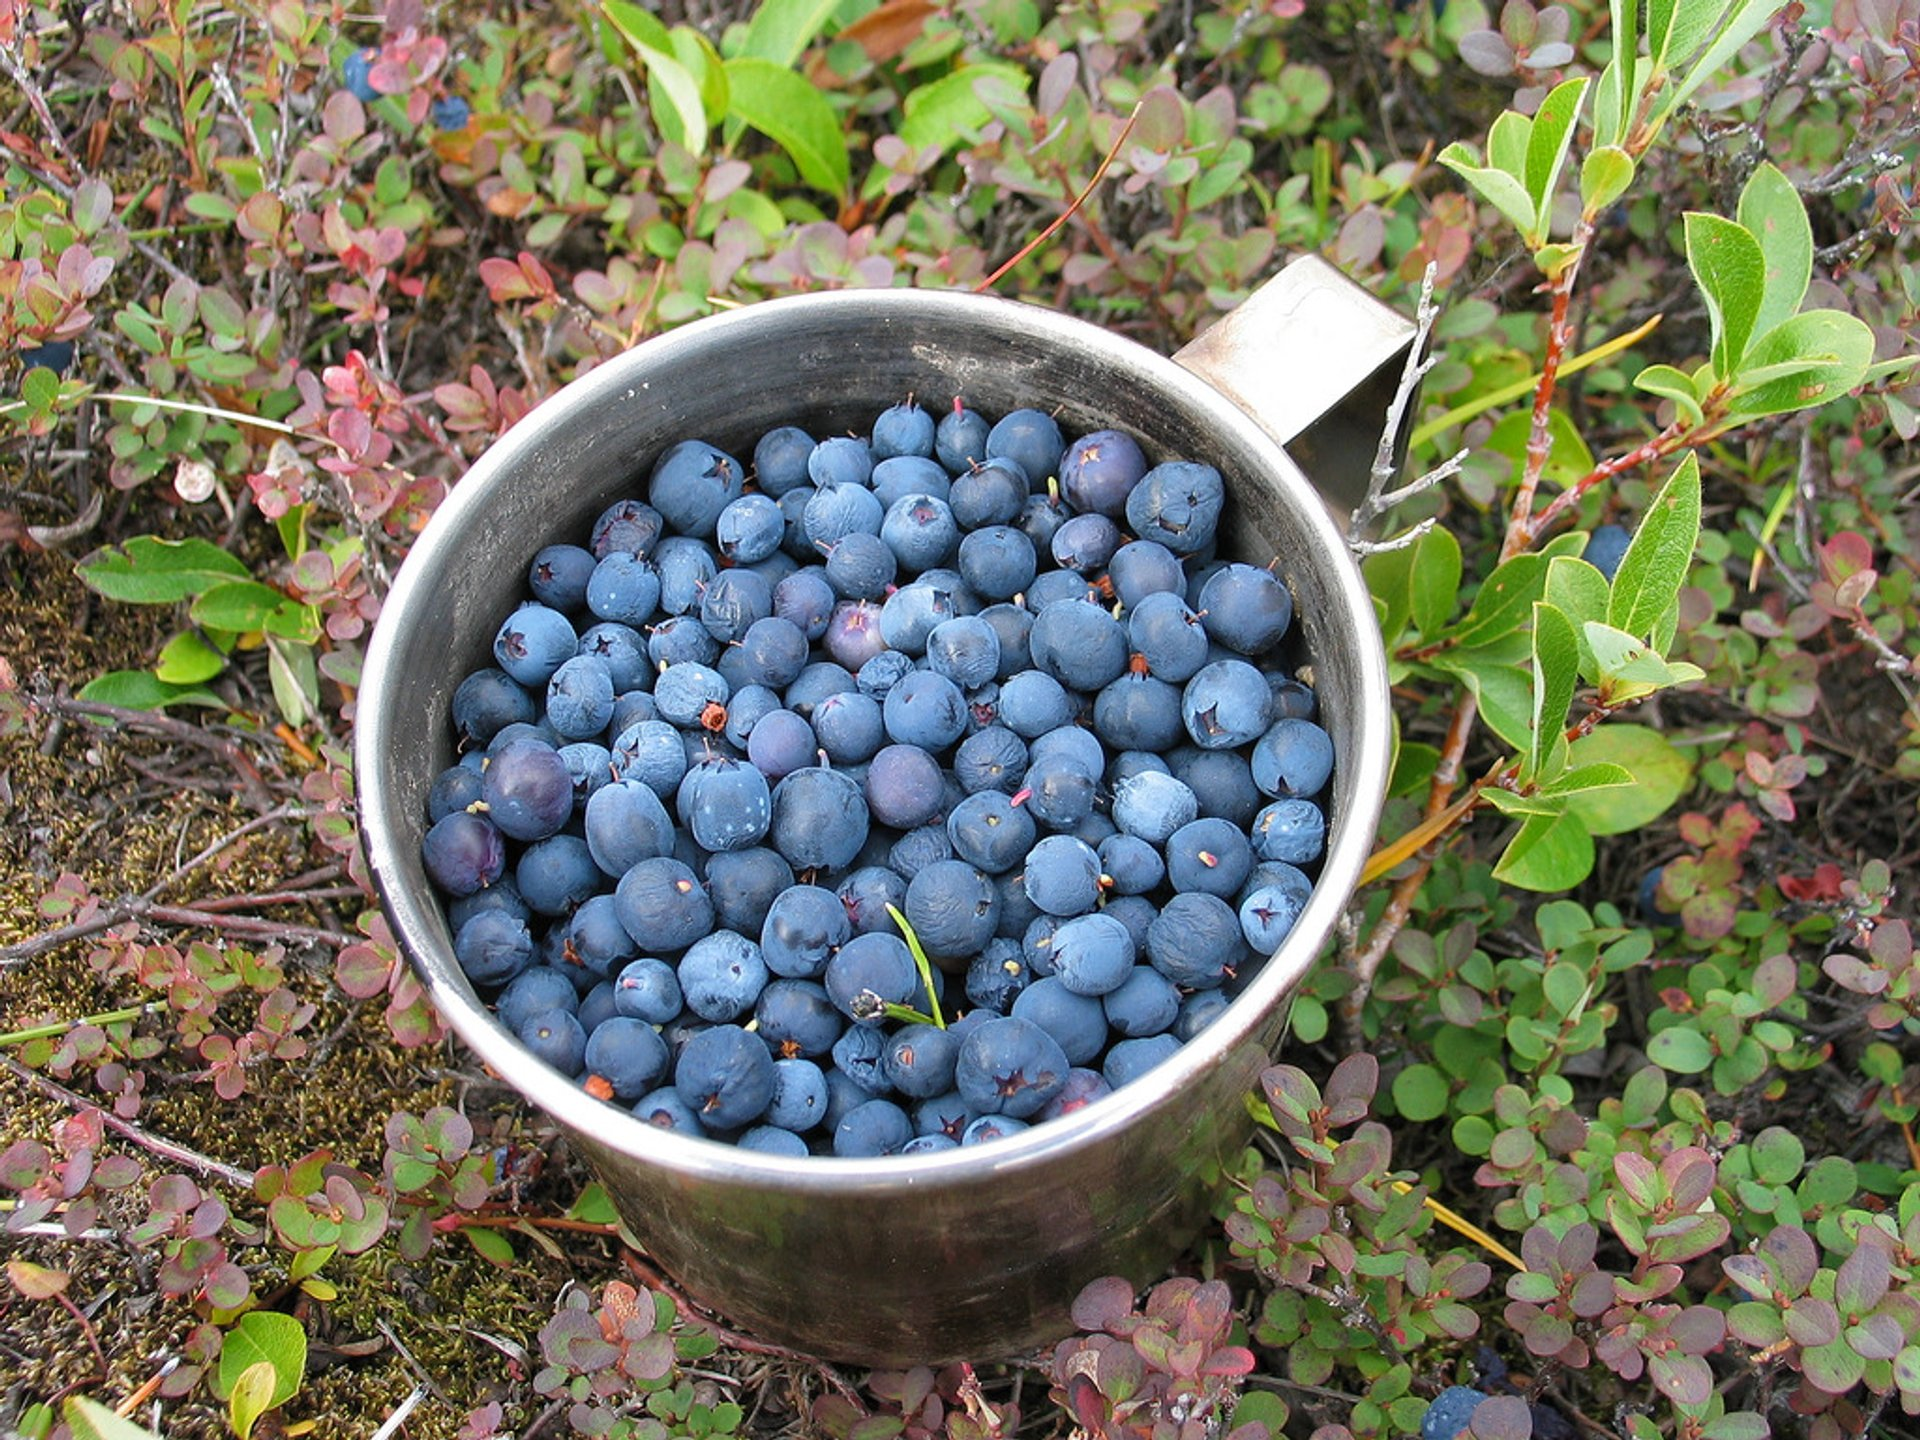 Wild Berry Season in Greenland 2020 - Best Time